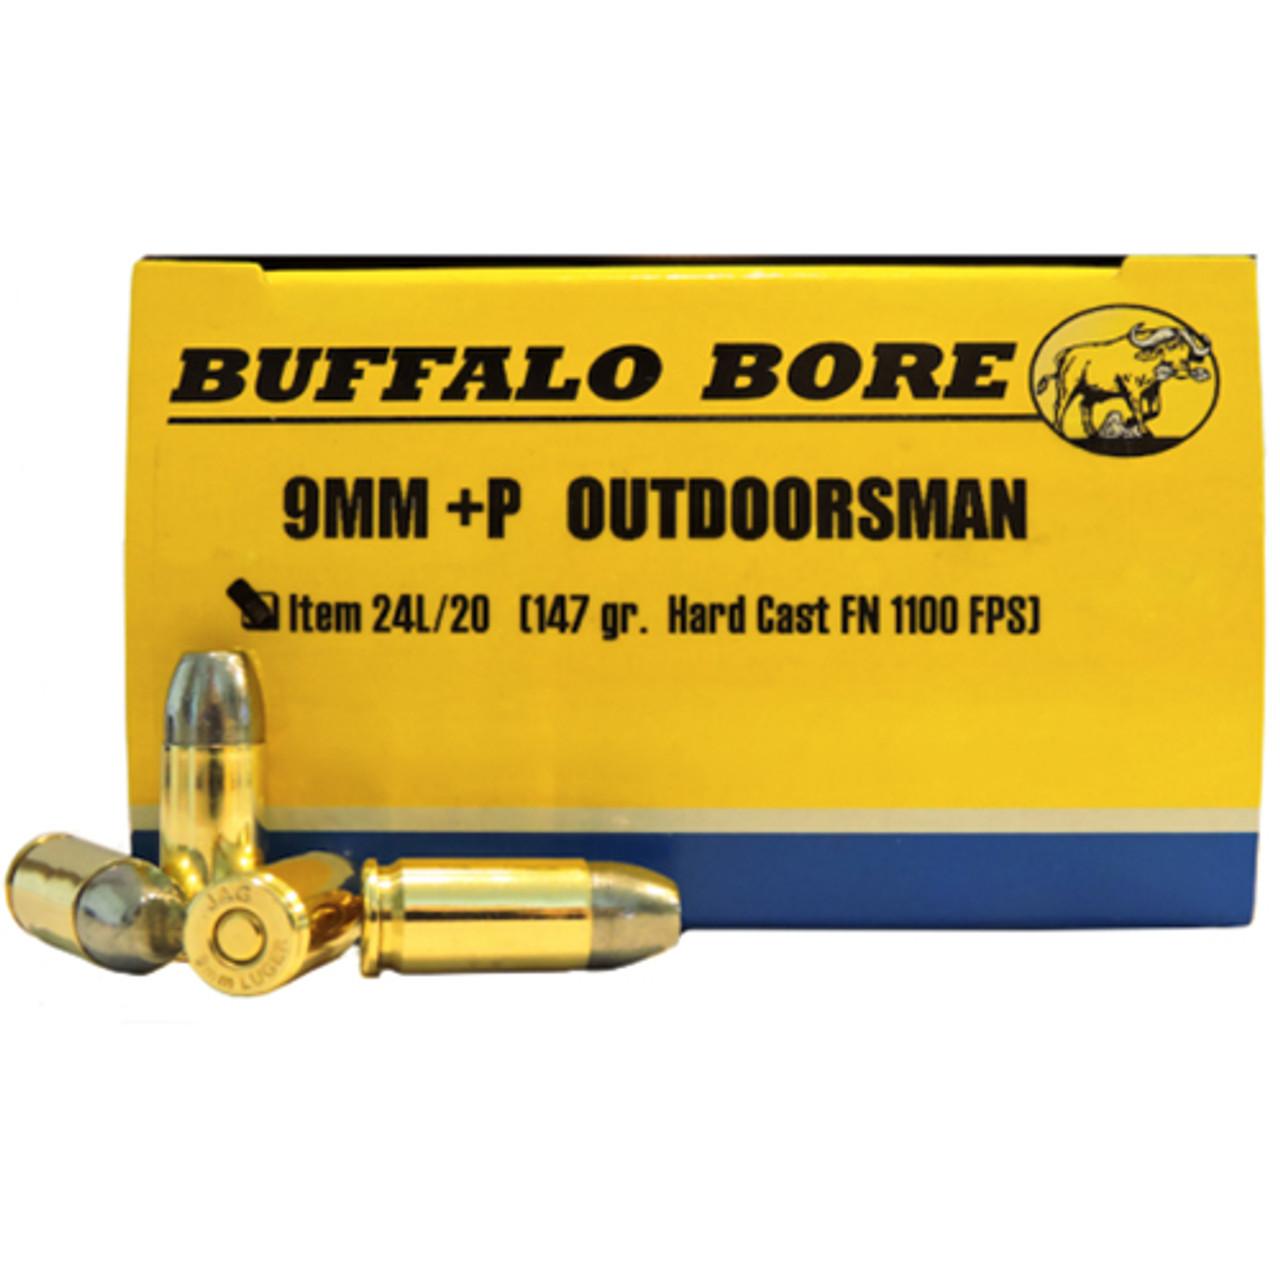 Buffalo Bore Ammunition Outdoorsman 9mm Luger +P 147 Grain Hard Cast Lead  Flat Nose Box of 20, UPC :651815024141